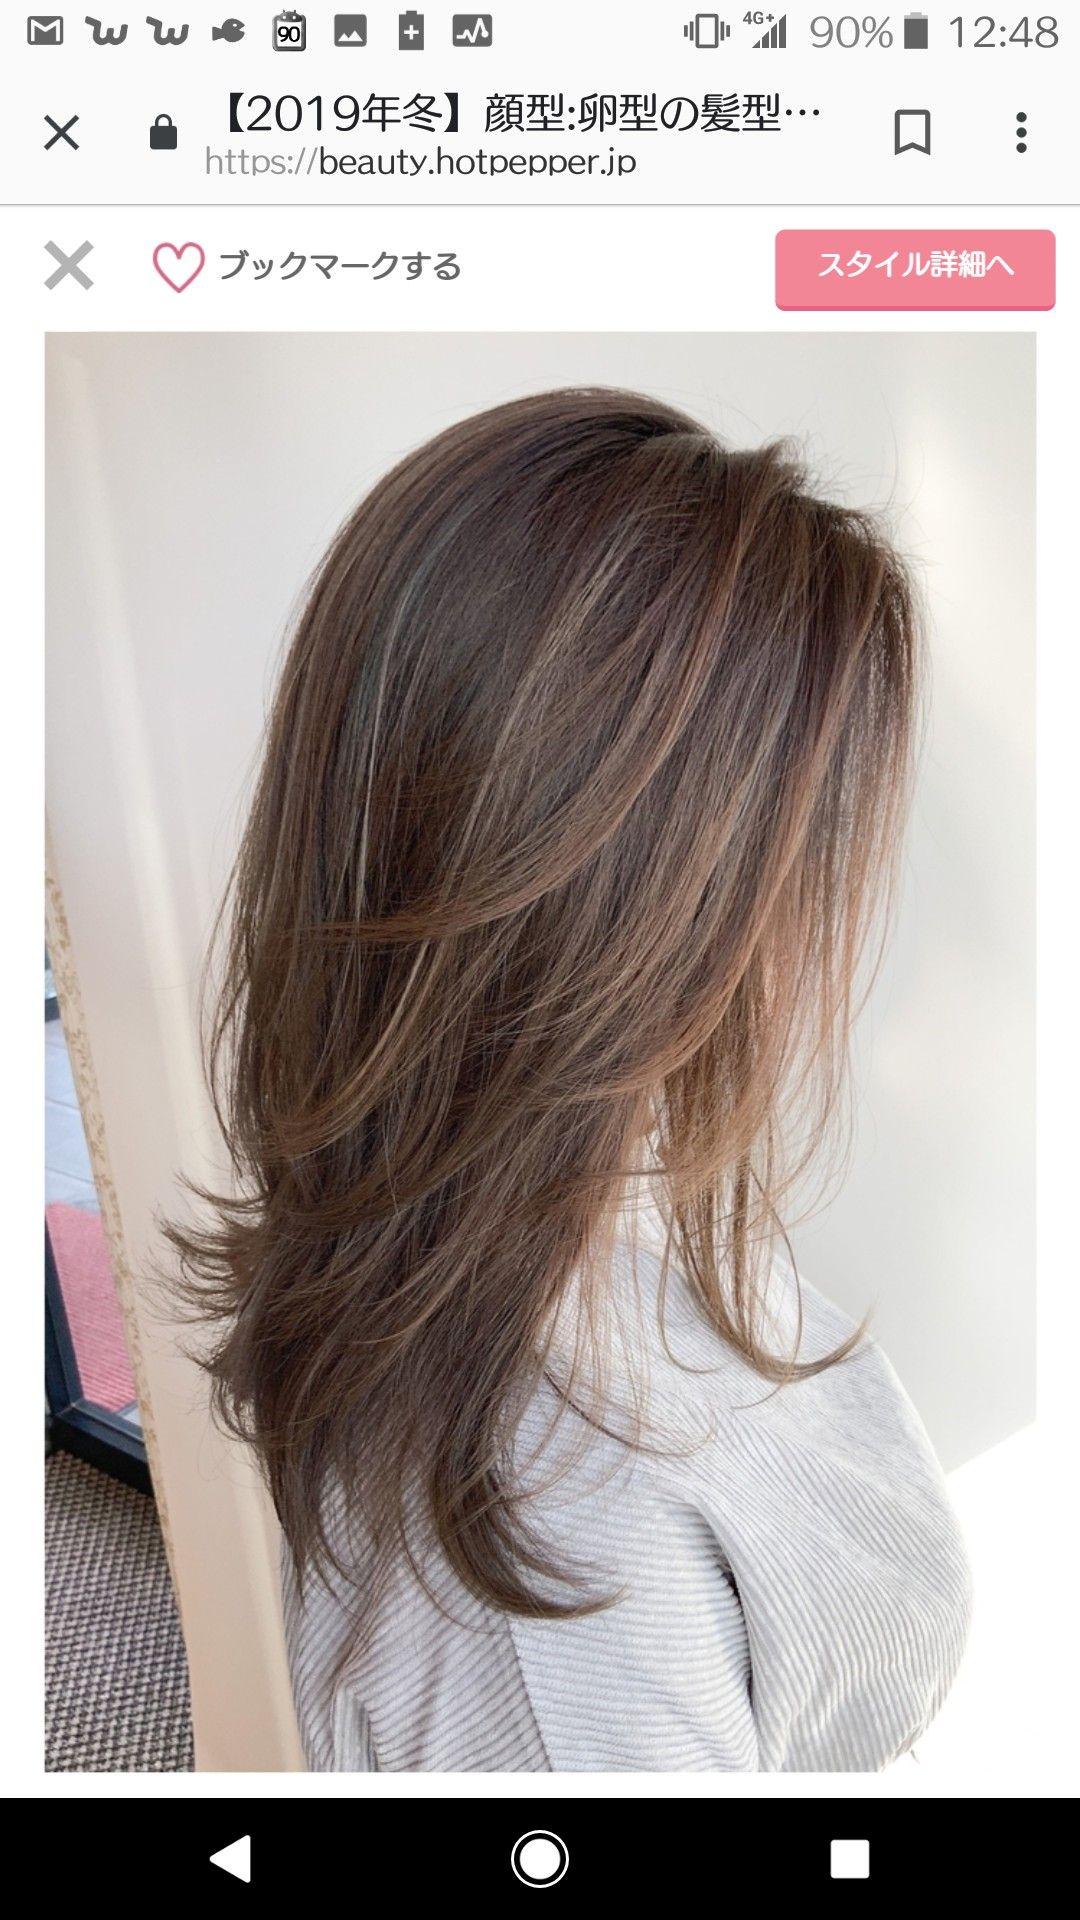 Pin By Sasa Yoo On Hair Hair Color For Morena Medium Hair Styles Brown Blonde Hair